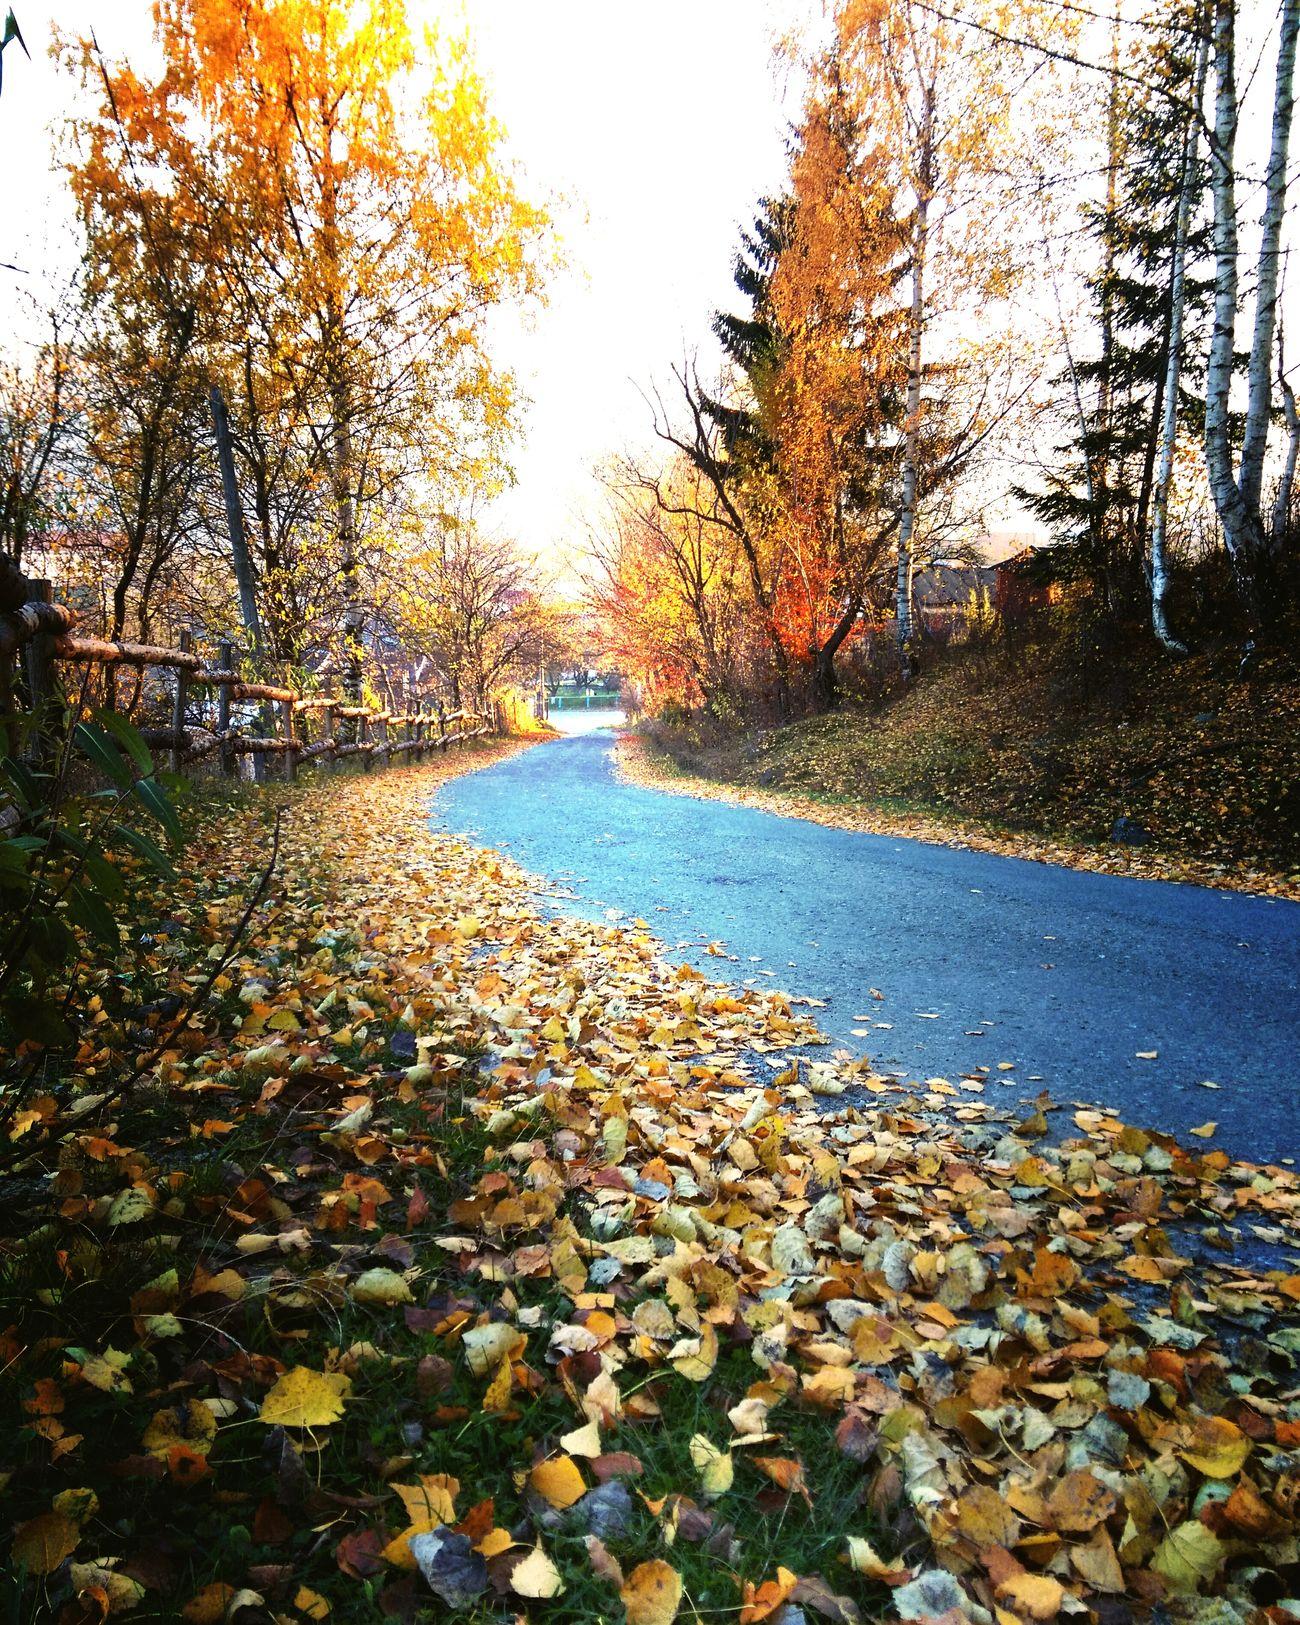 Autumn Autumn Colors Yellow Leaves Roads Yaremche Ukraine Taking Photos Hello World Enjoying Life Coolplace Karpathian Mountains